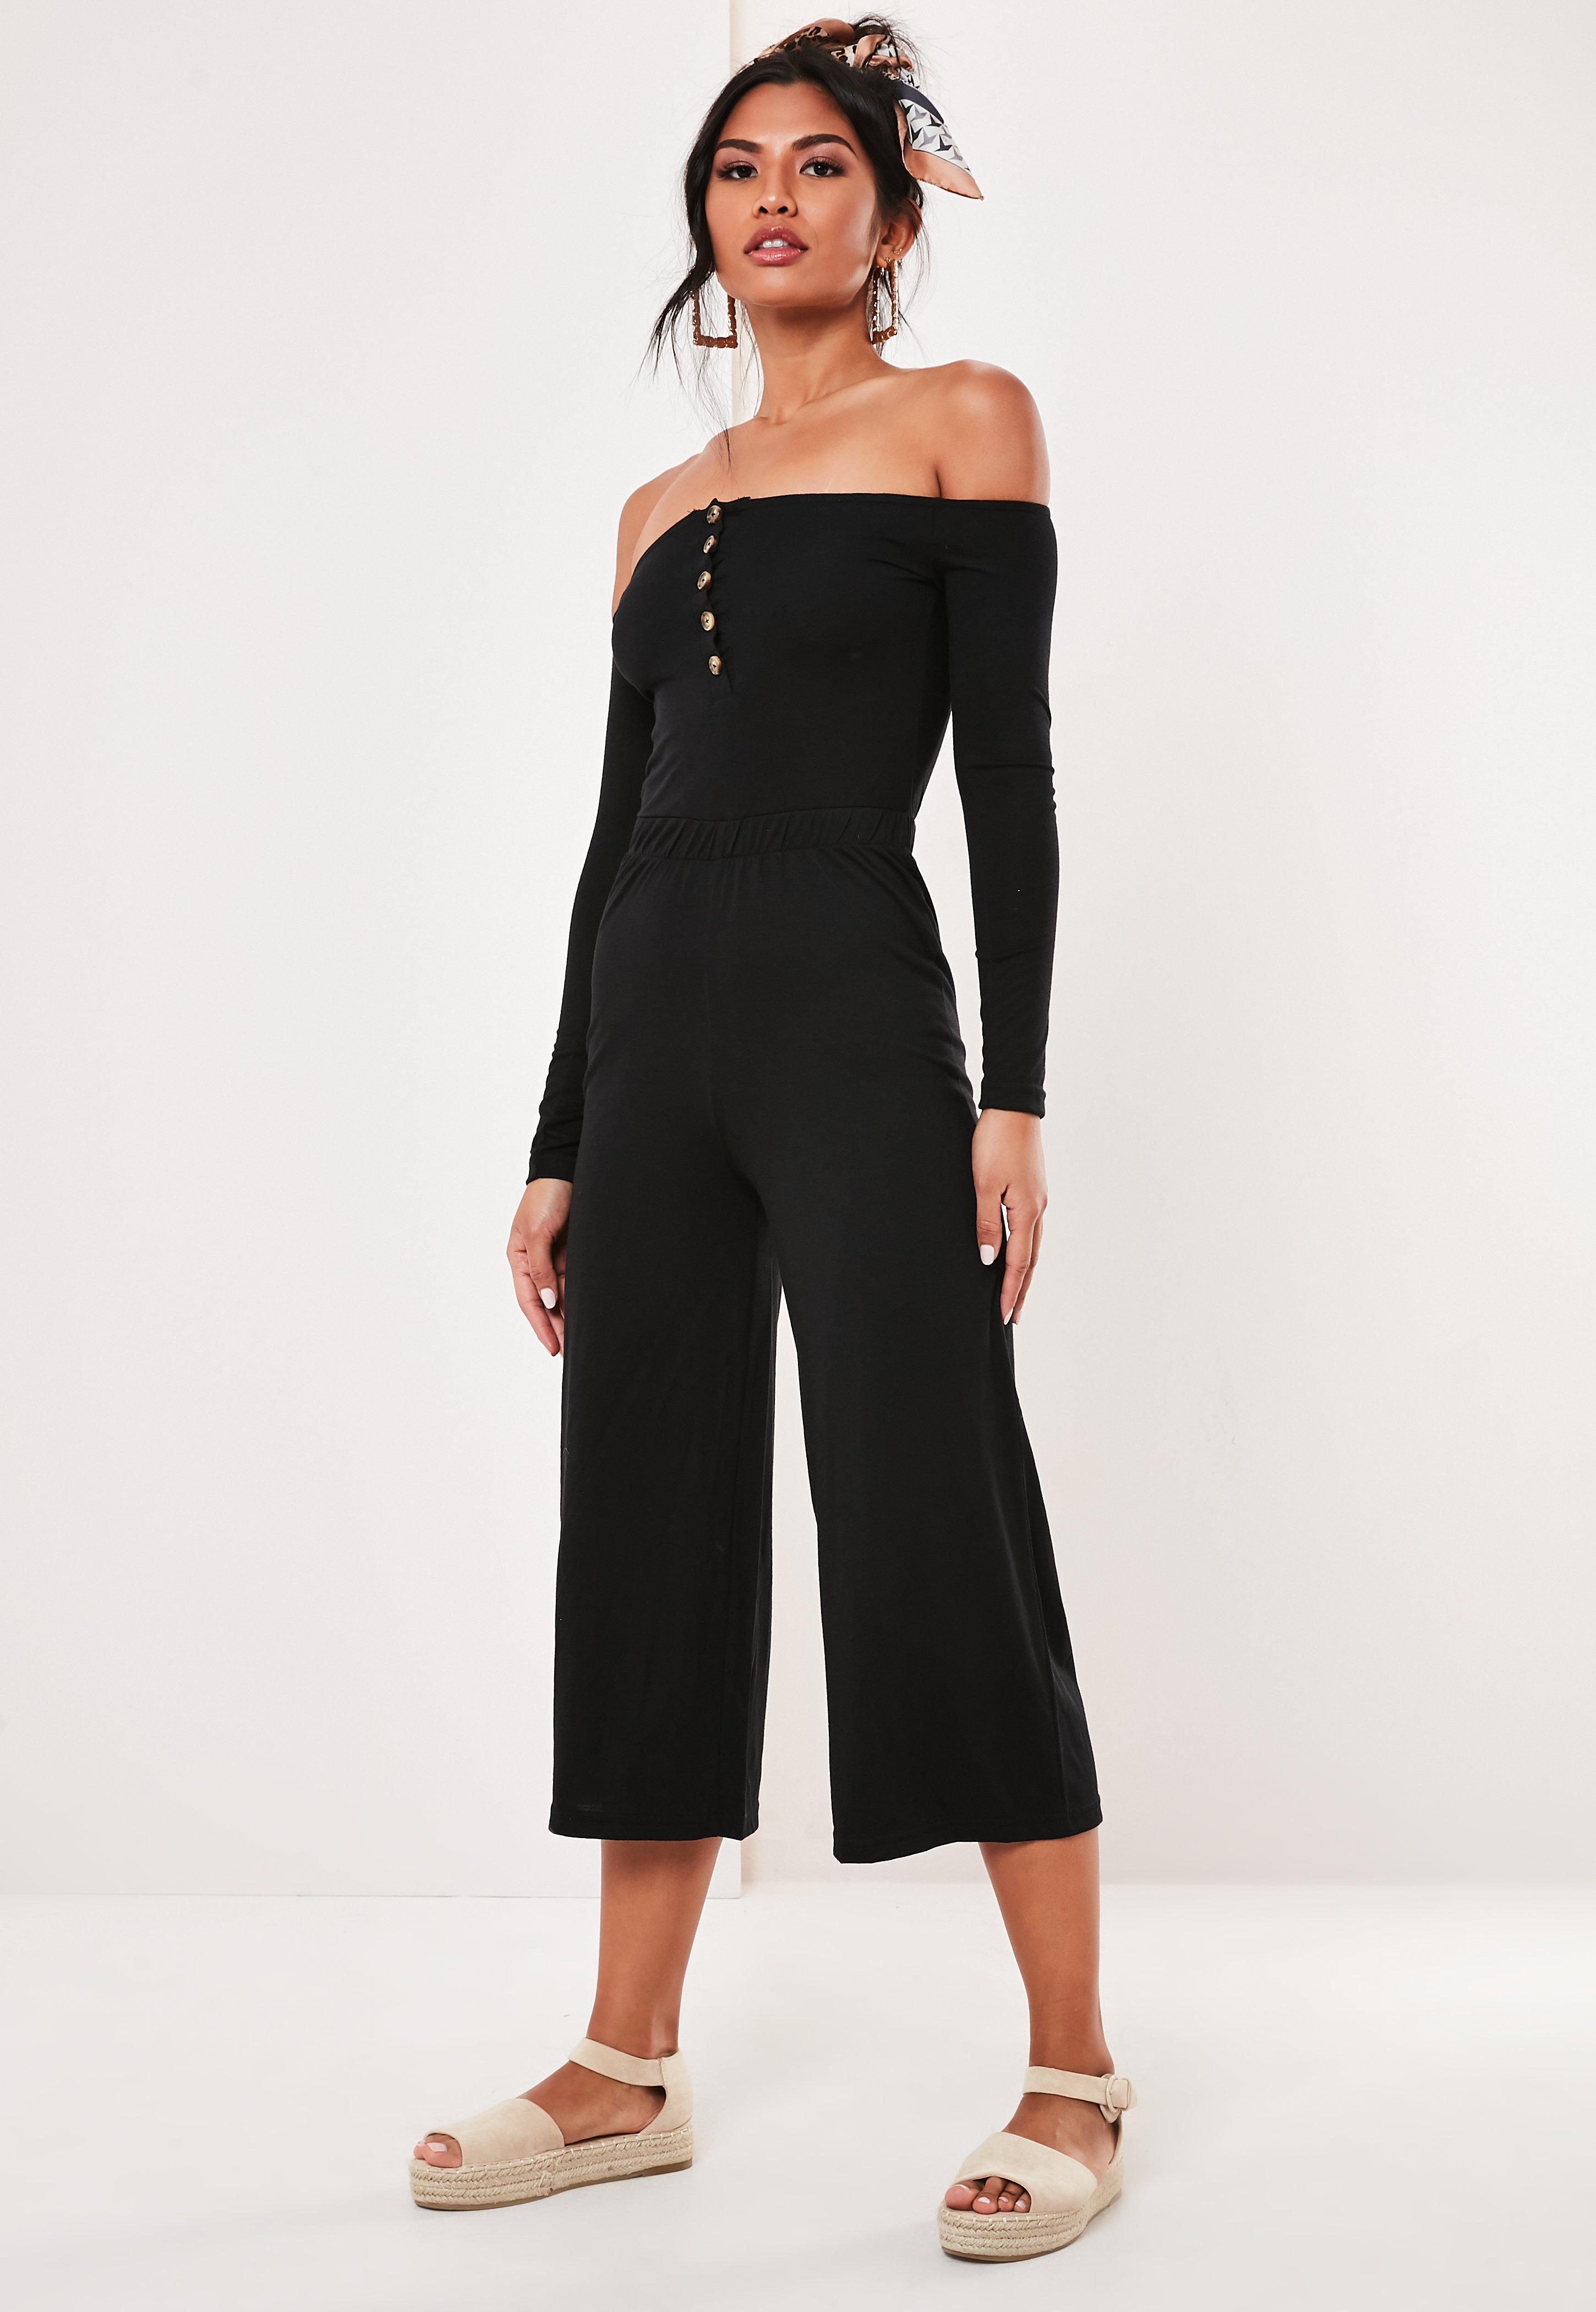 077a9be236 Black Jumpsuits